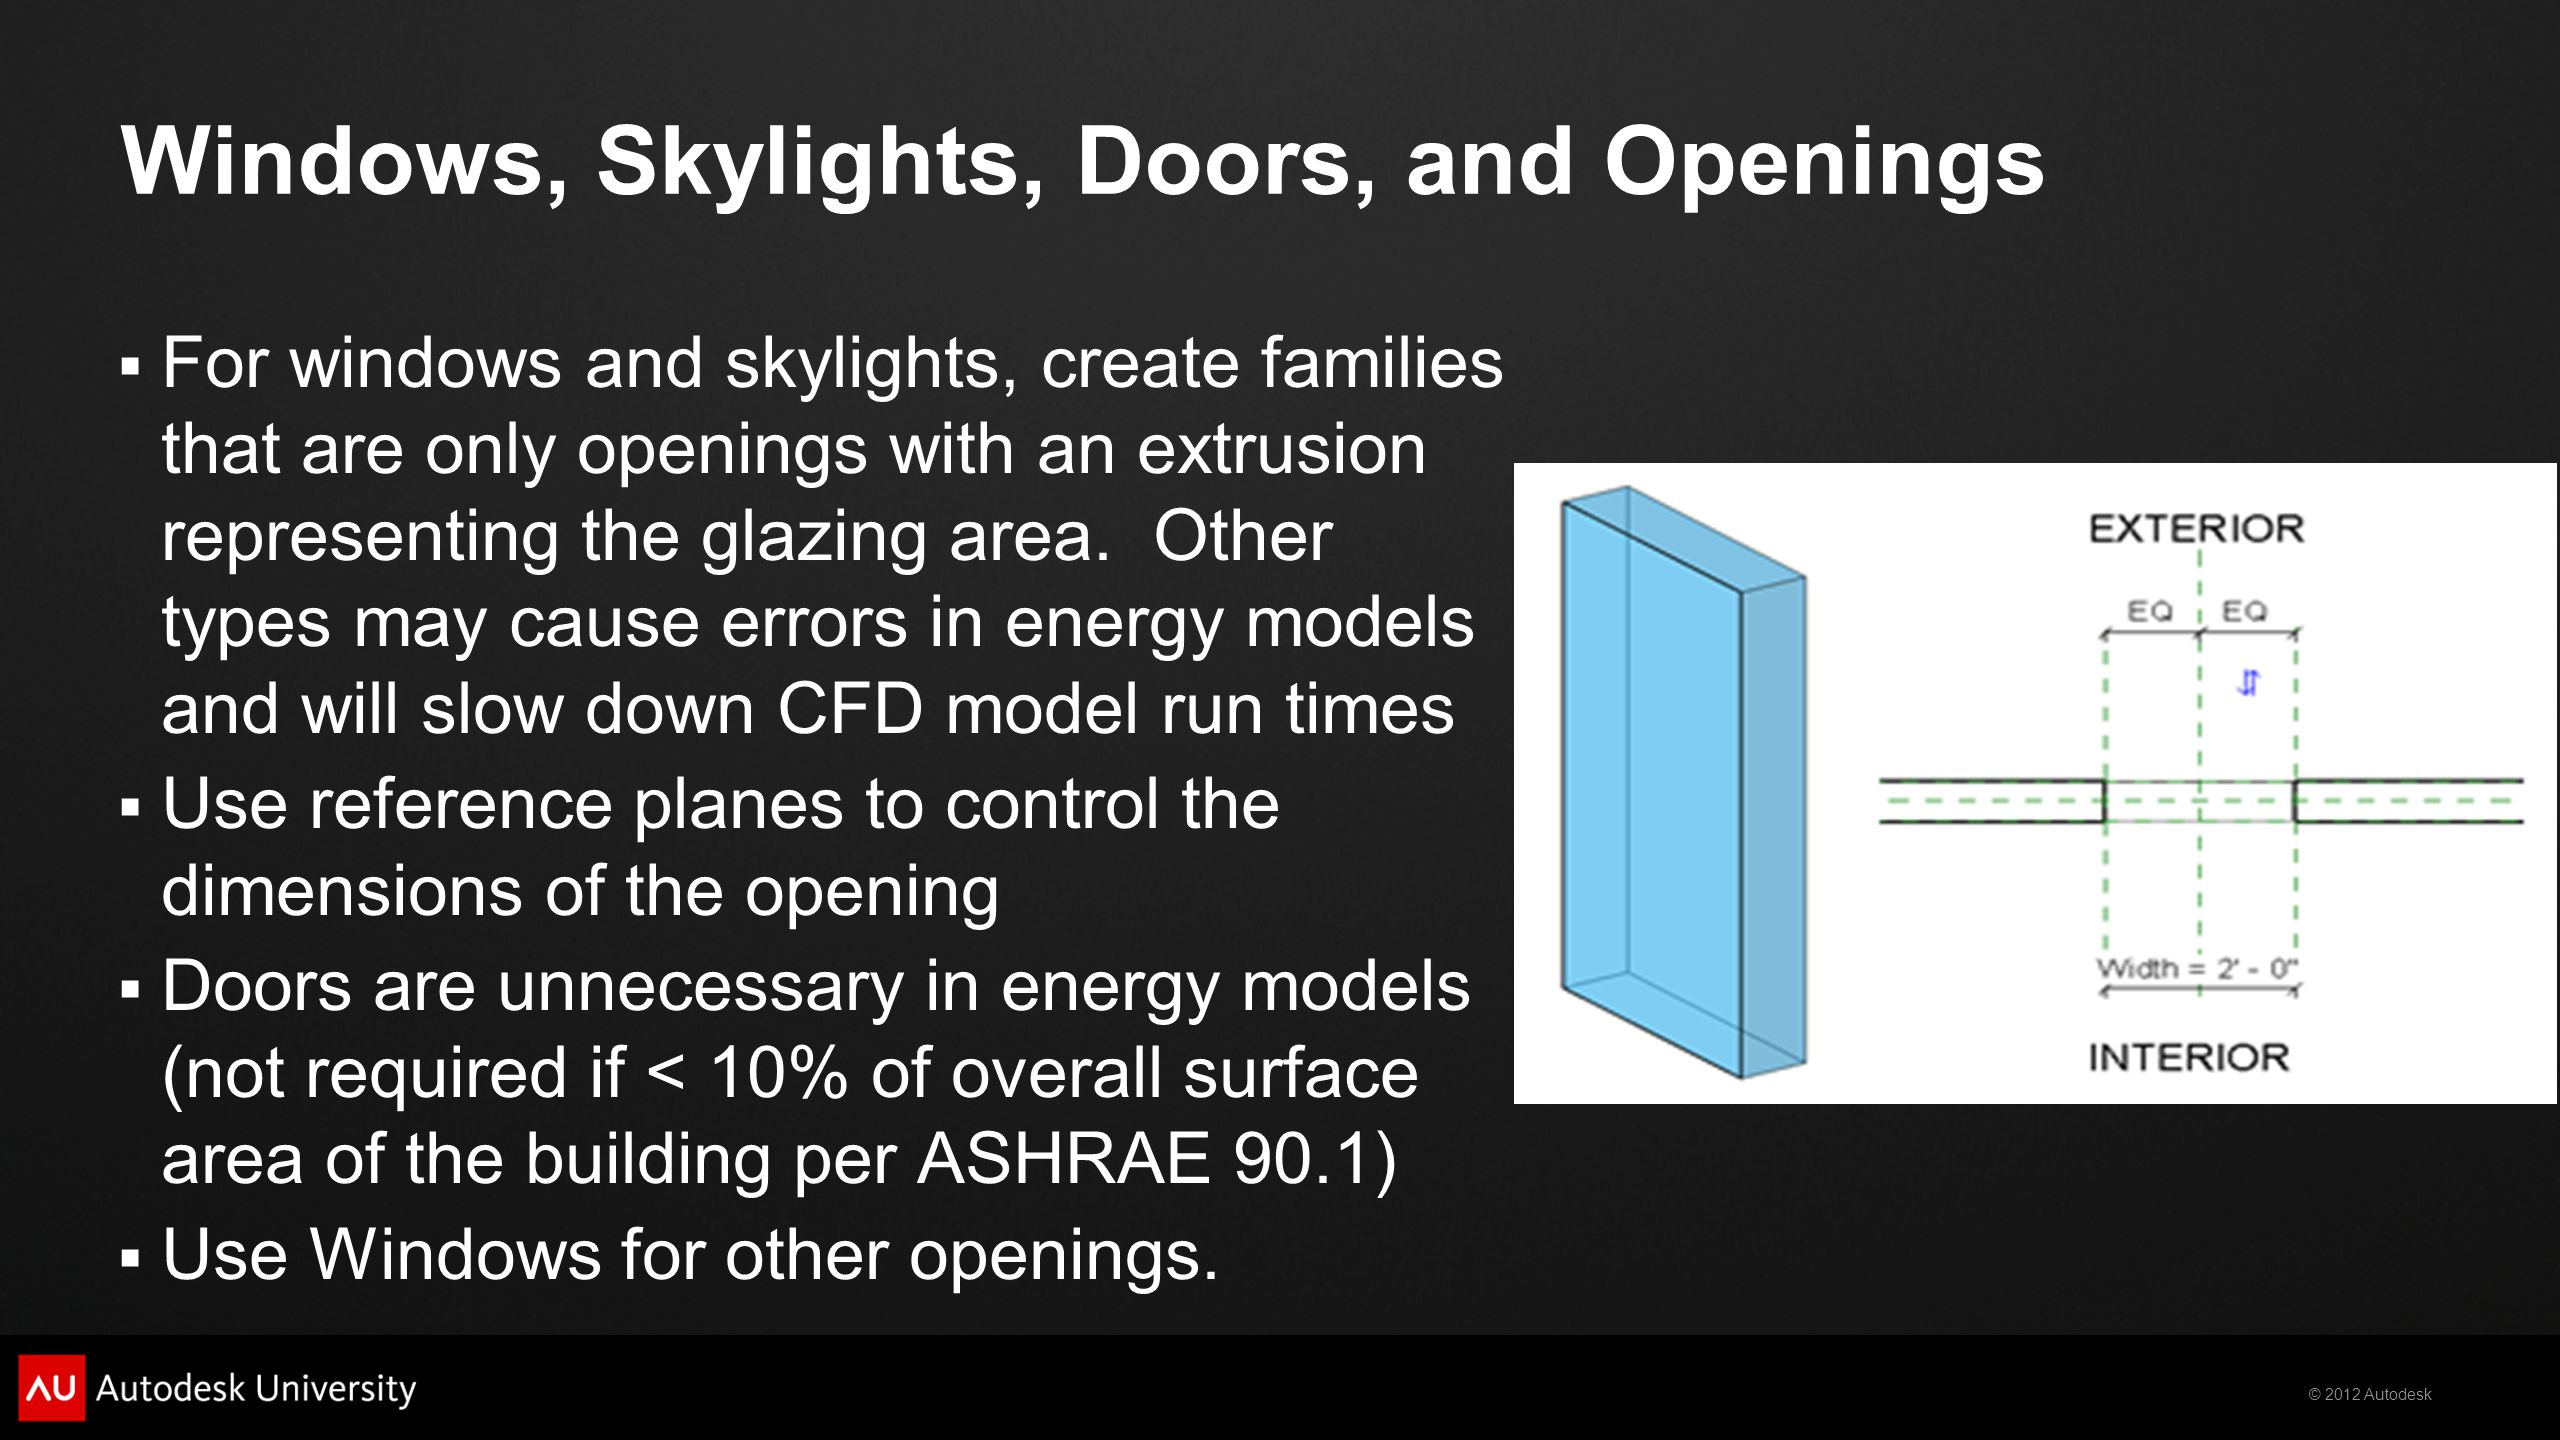 Windows, Skylights, Doors, and Openings